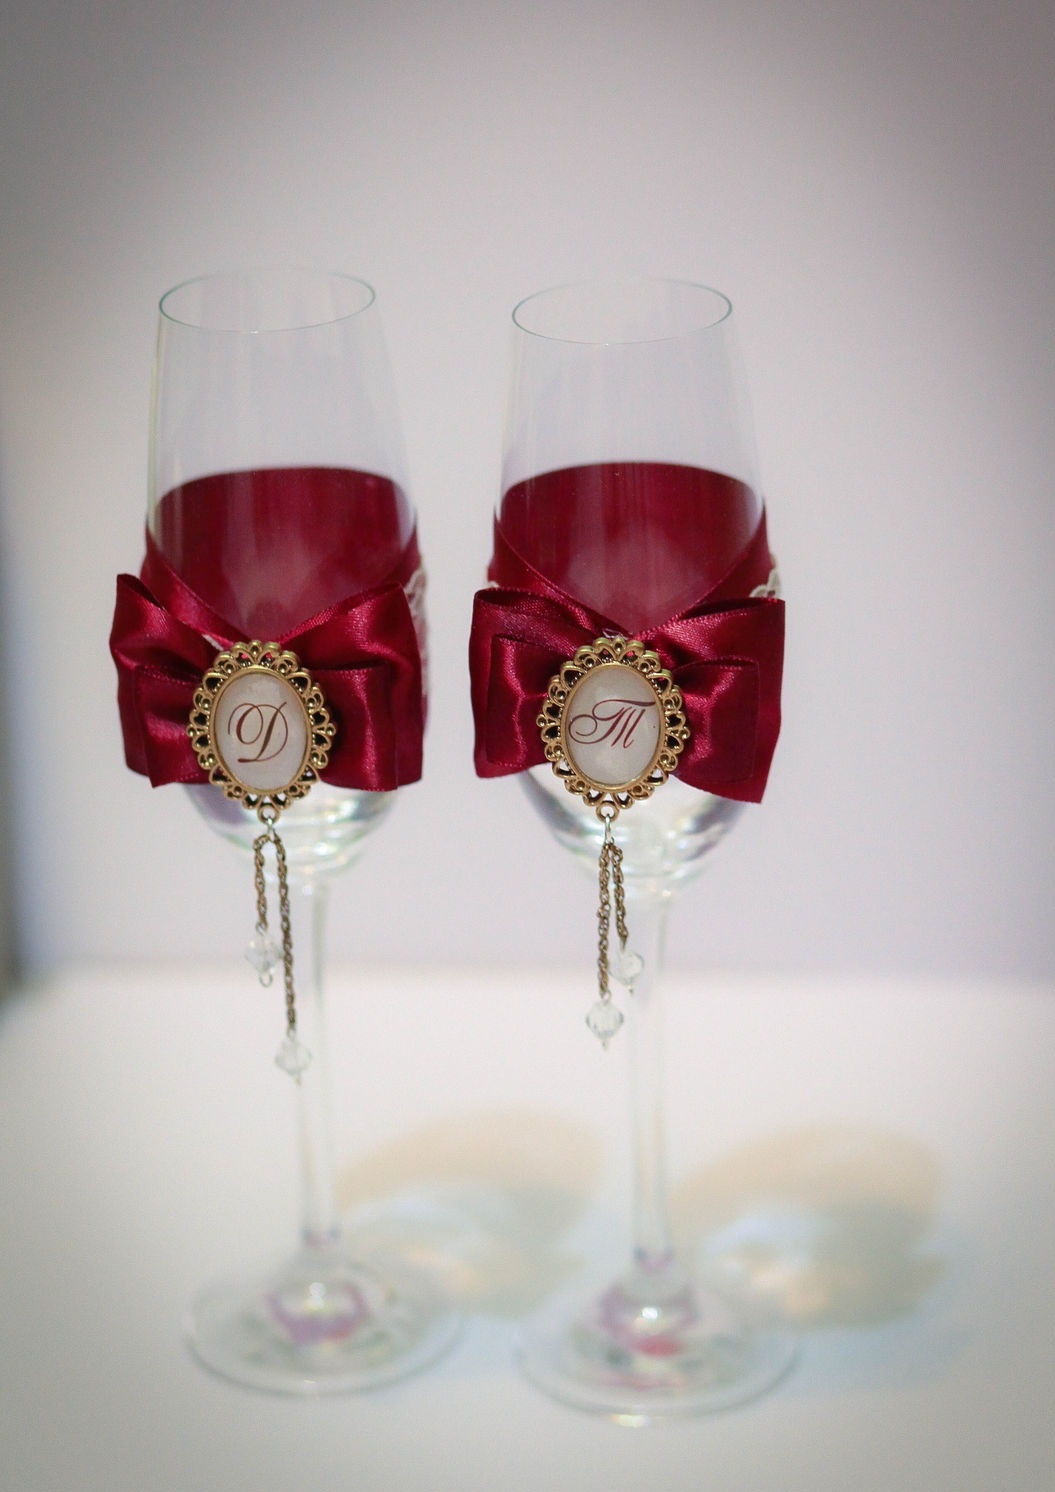 бокалы на свадьбу цвет марсала: банты